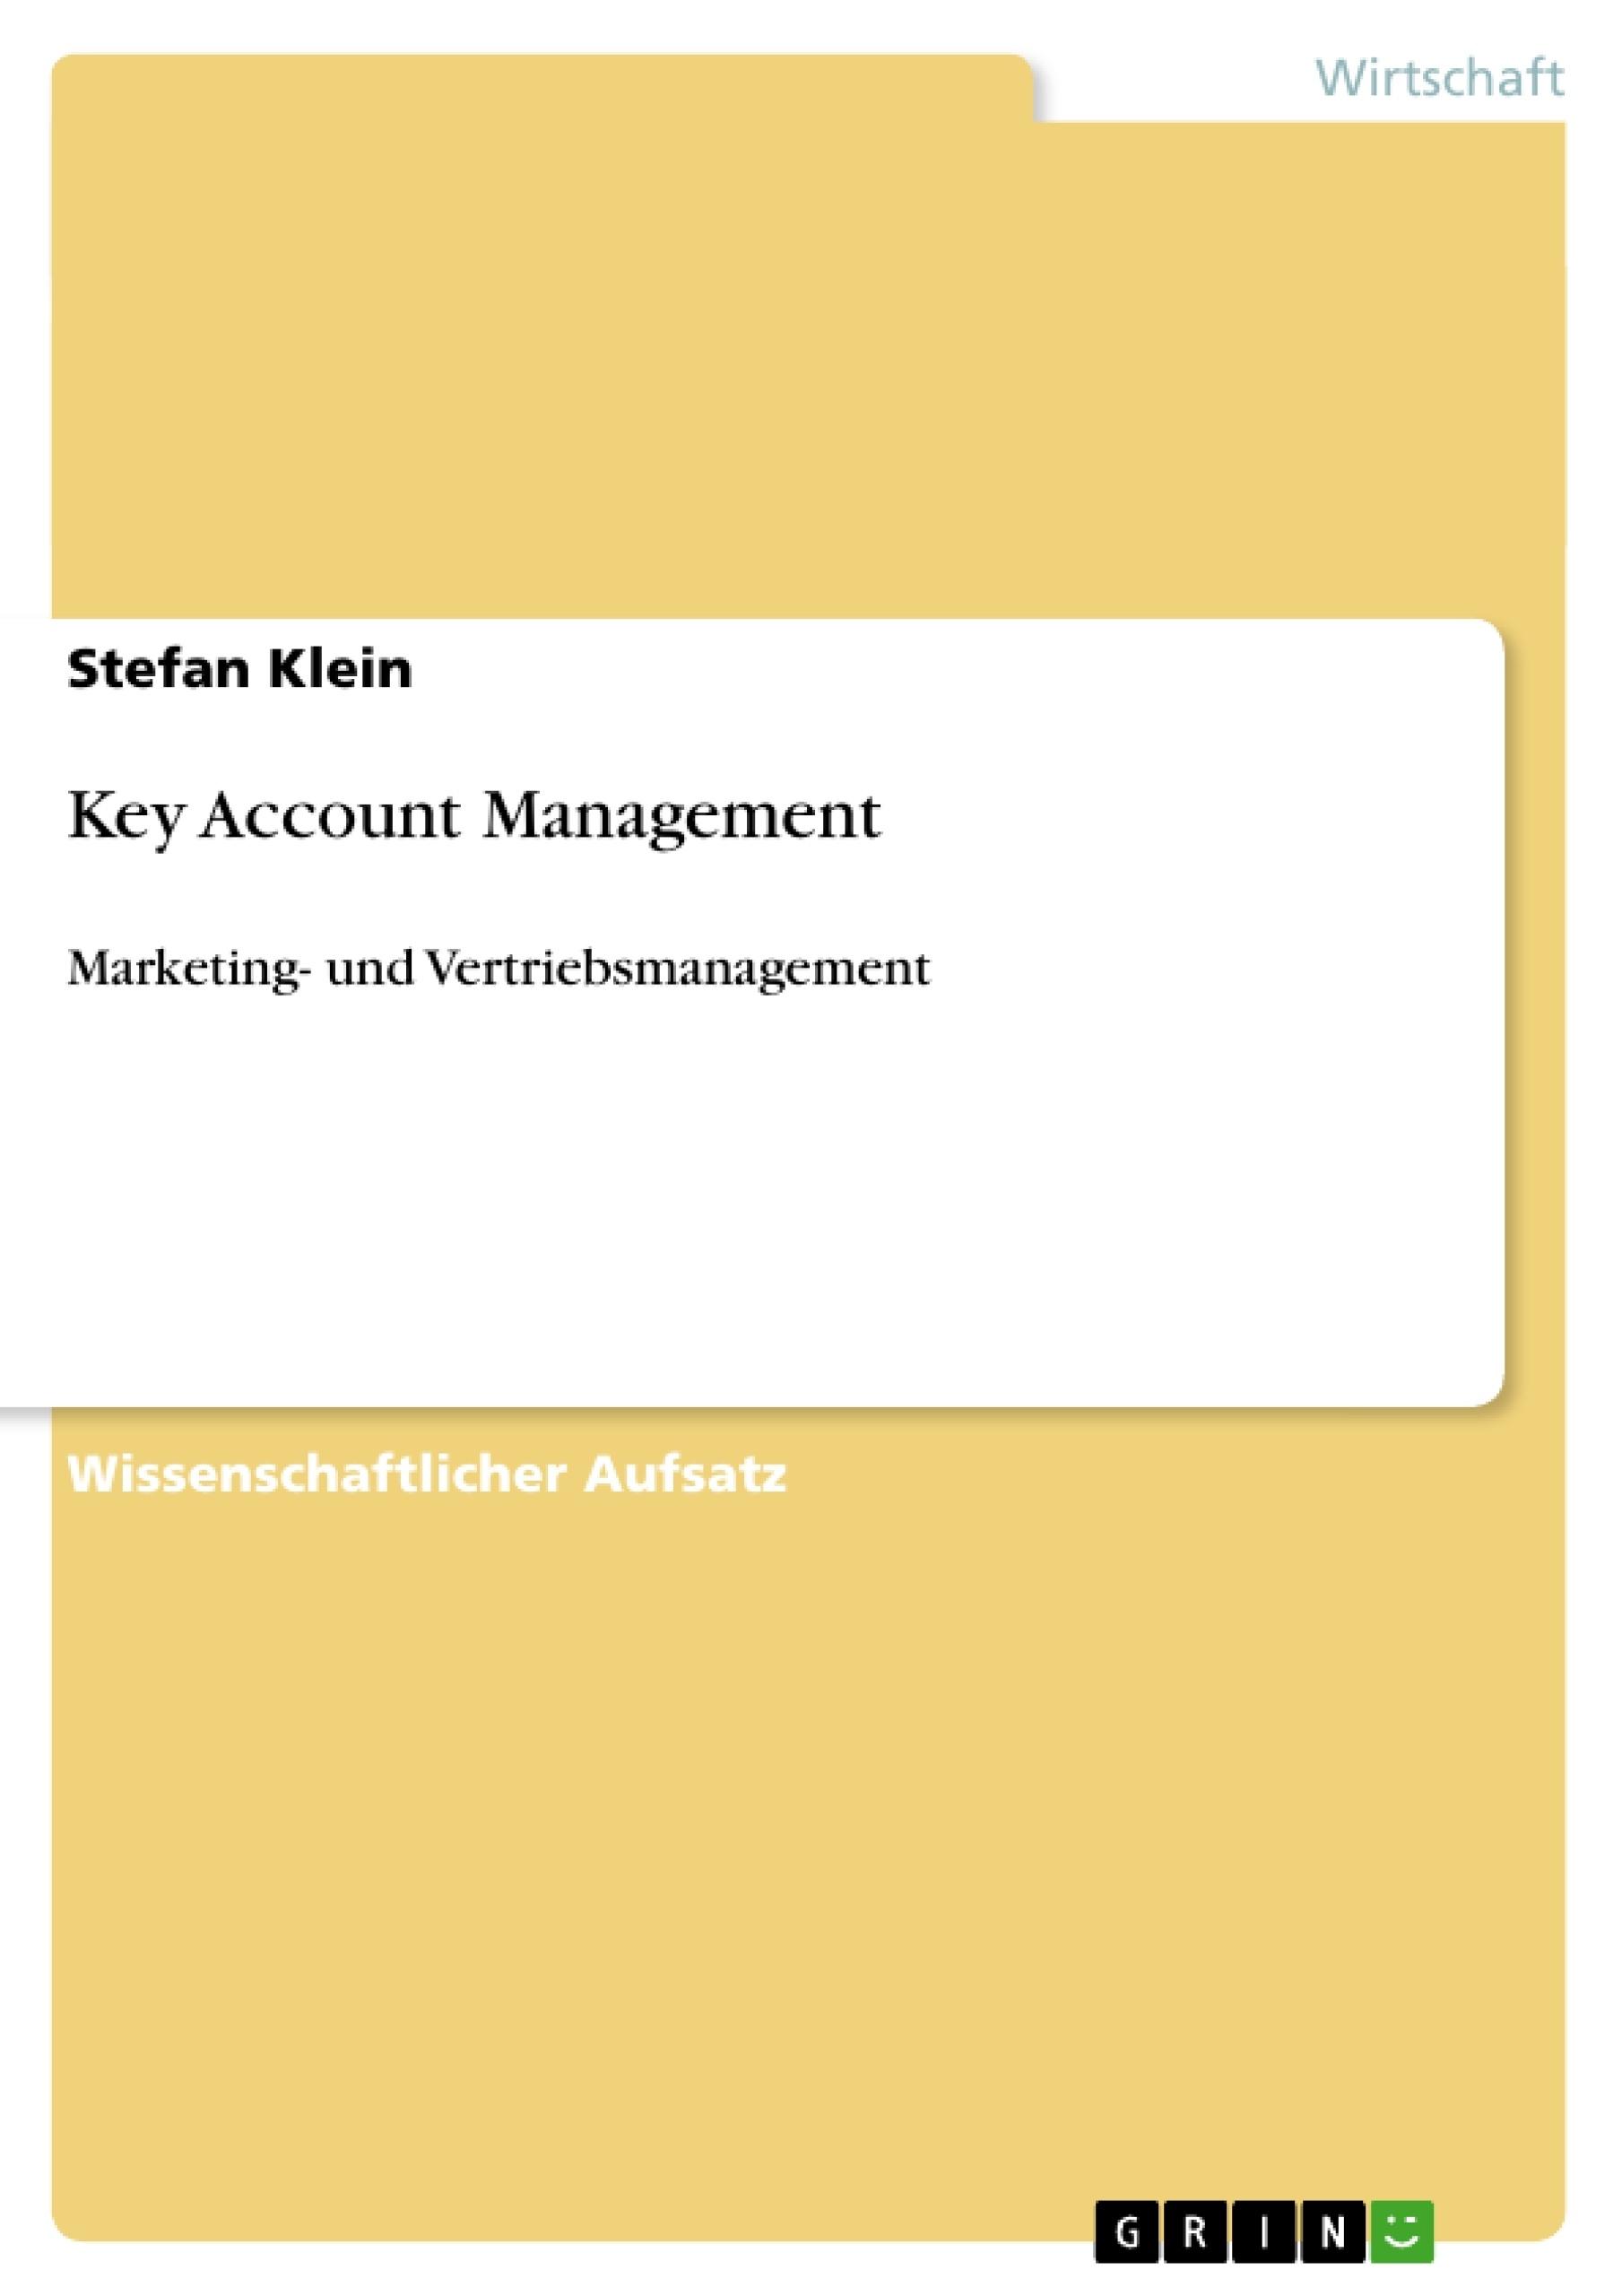 Titel: Key Account Management